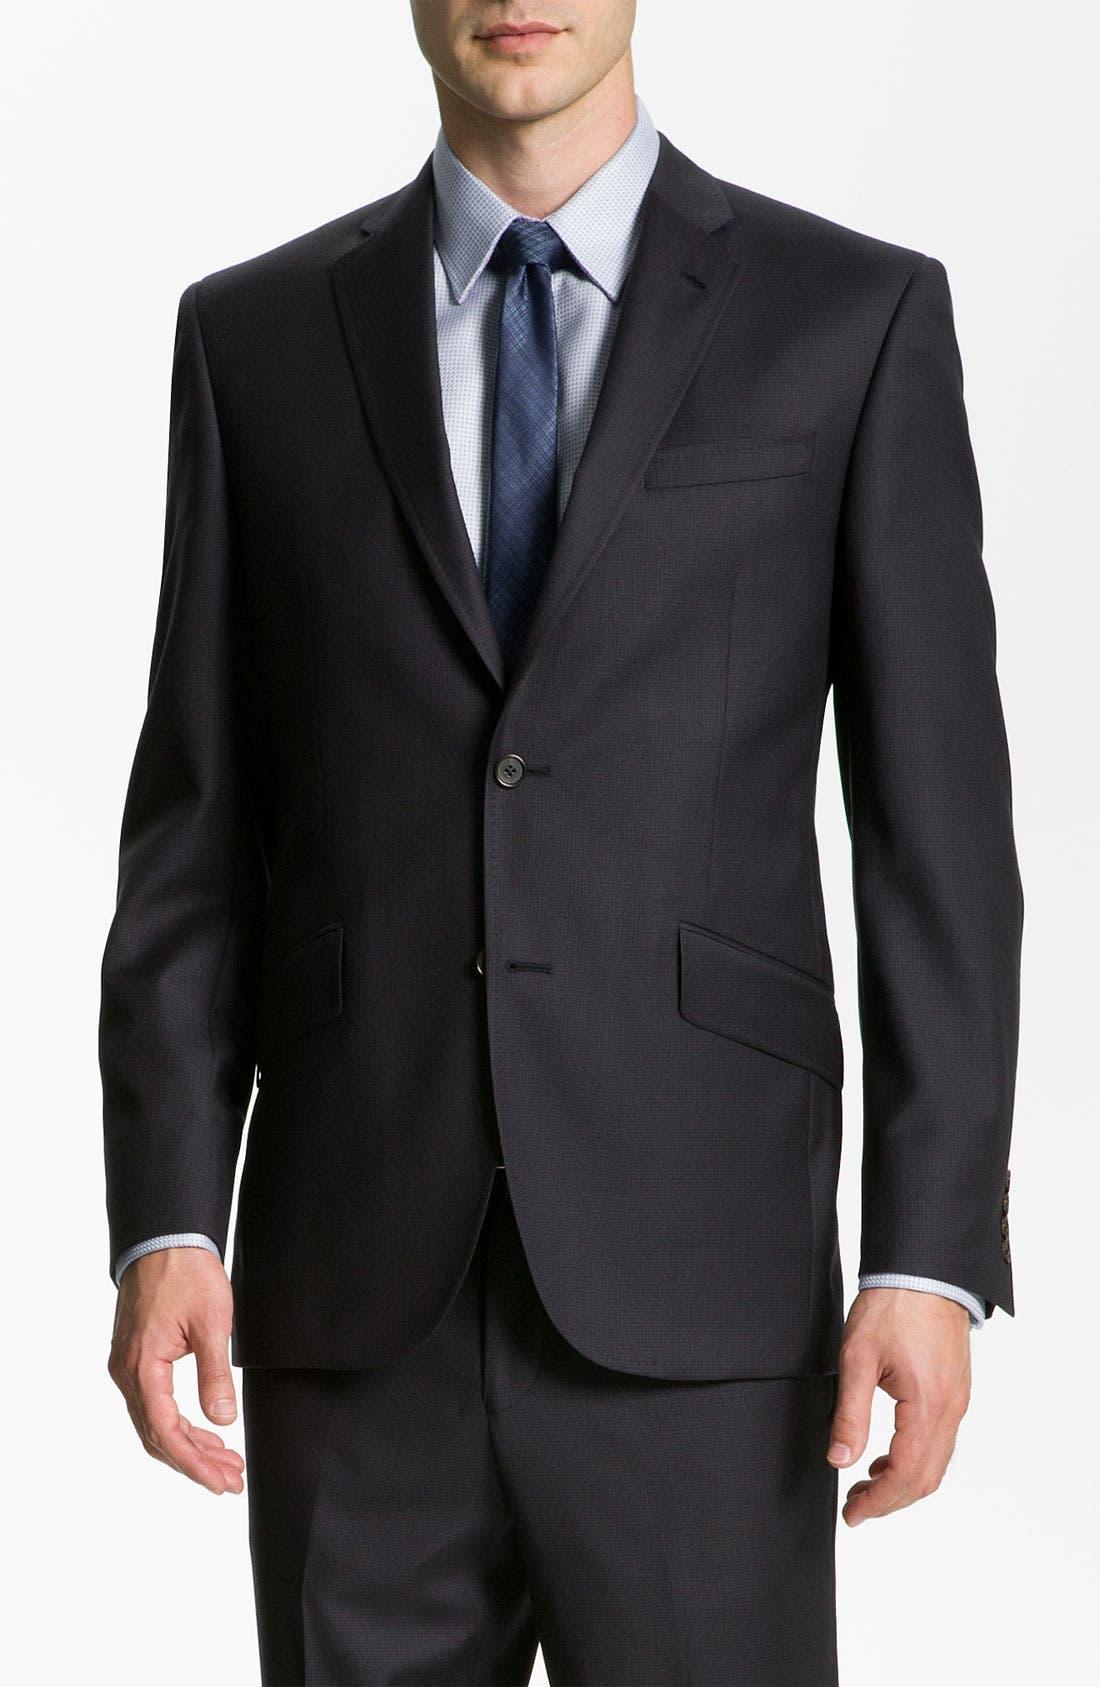 Alternate Image 1 Selected - Ted Baker London 'Jones' Trim Fit Stripe Suit